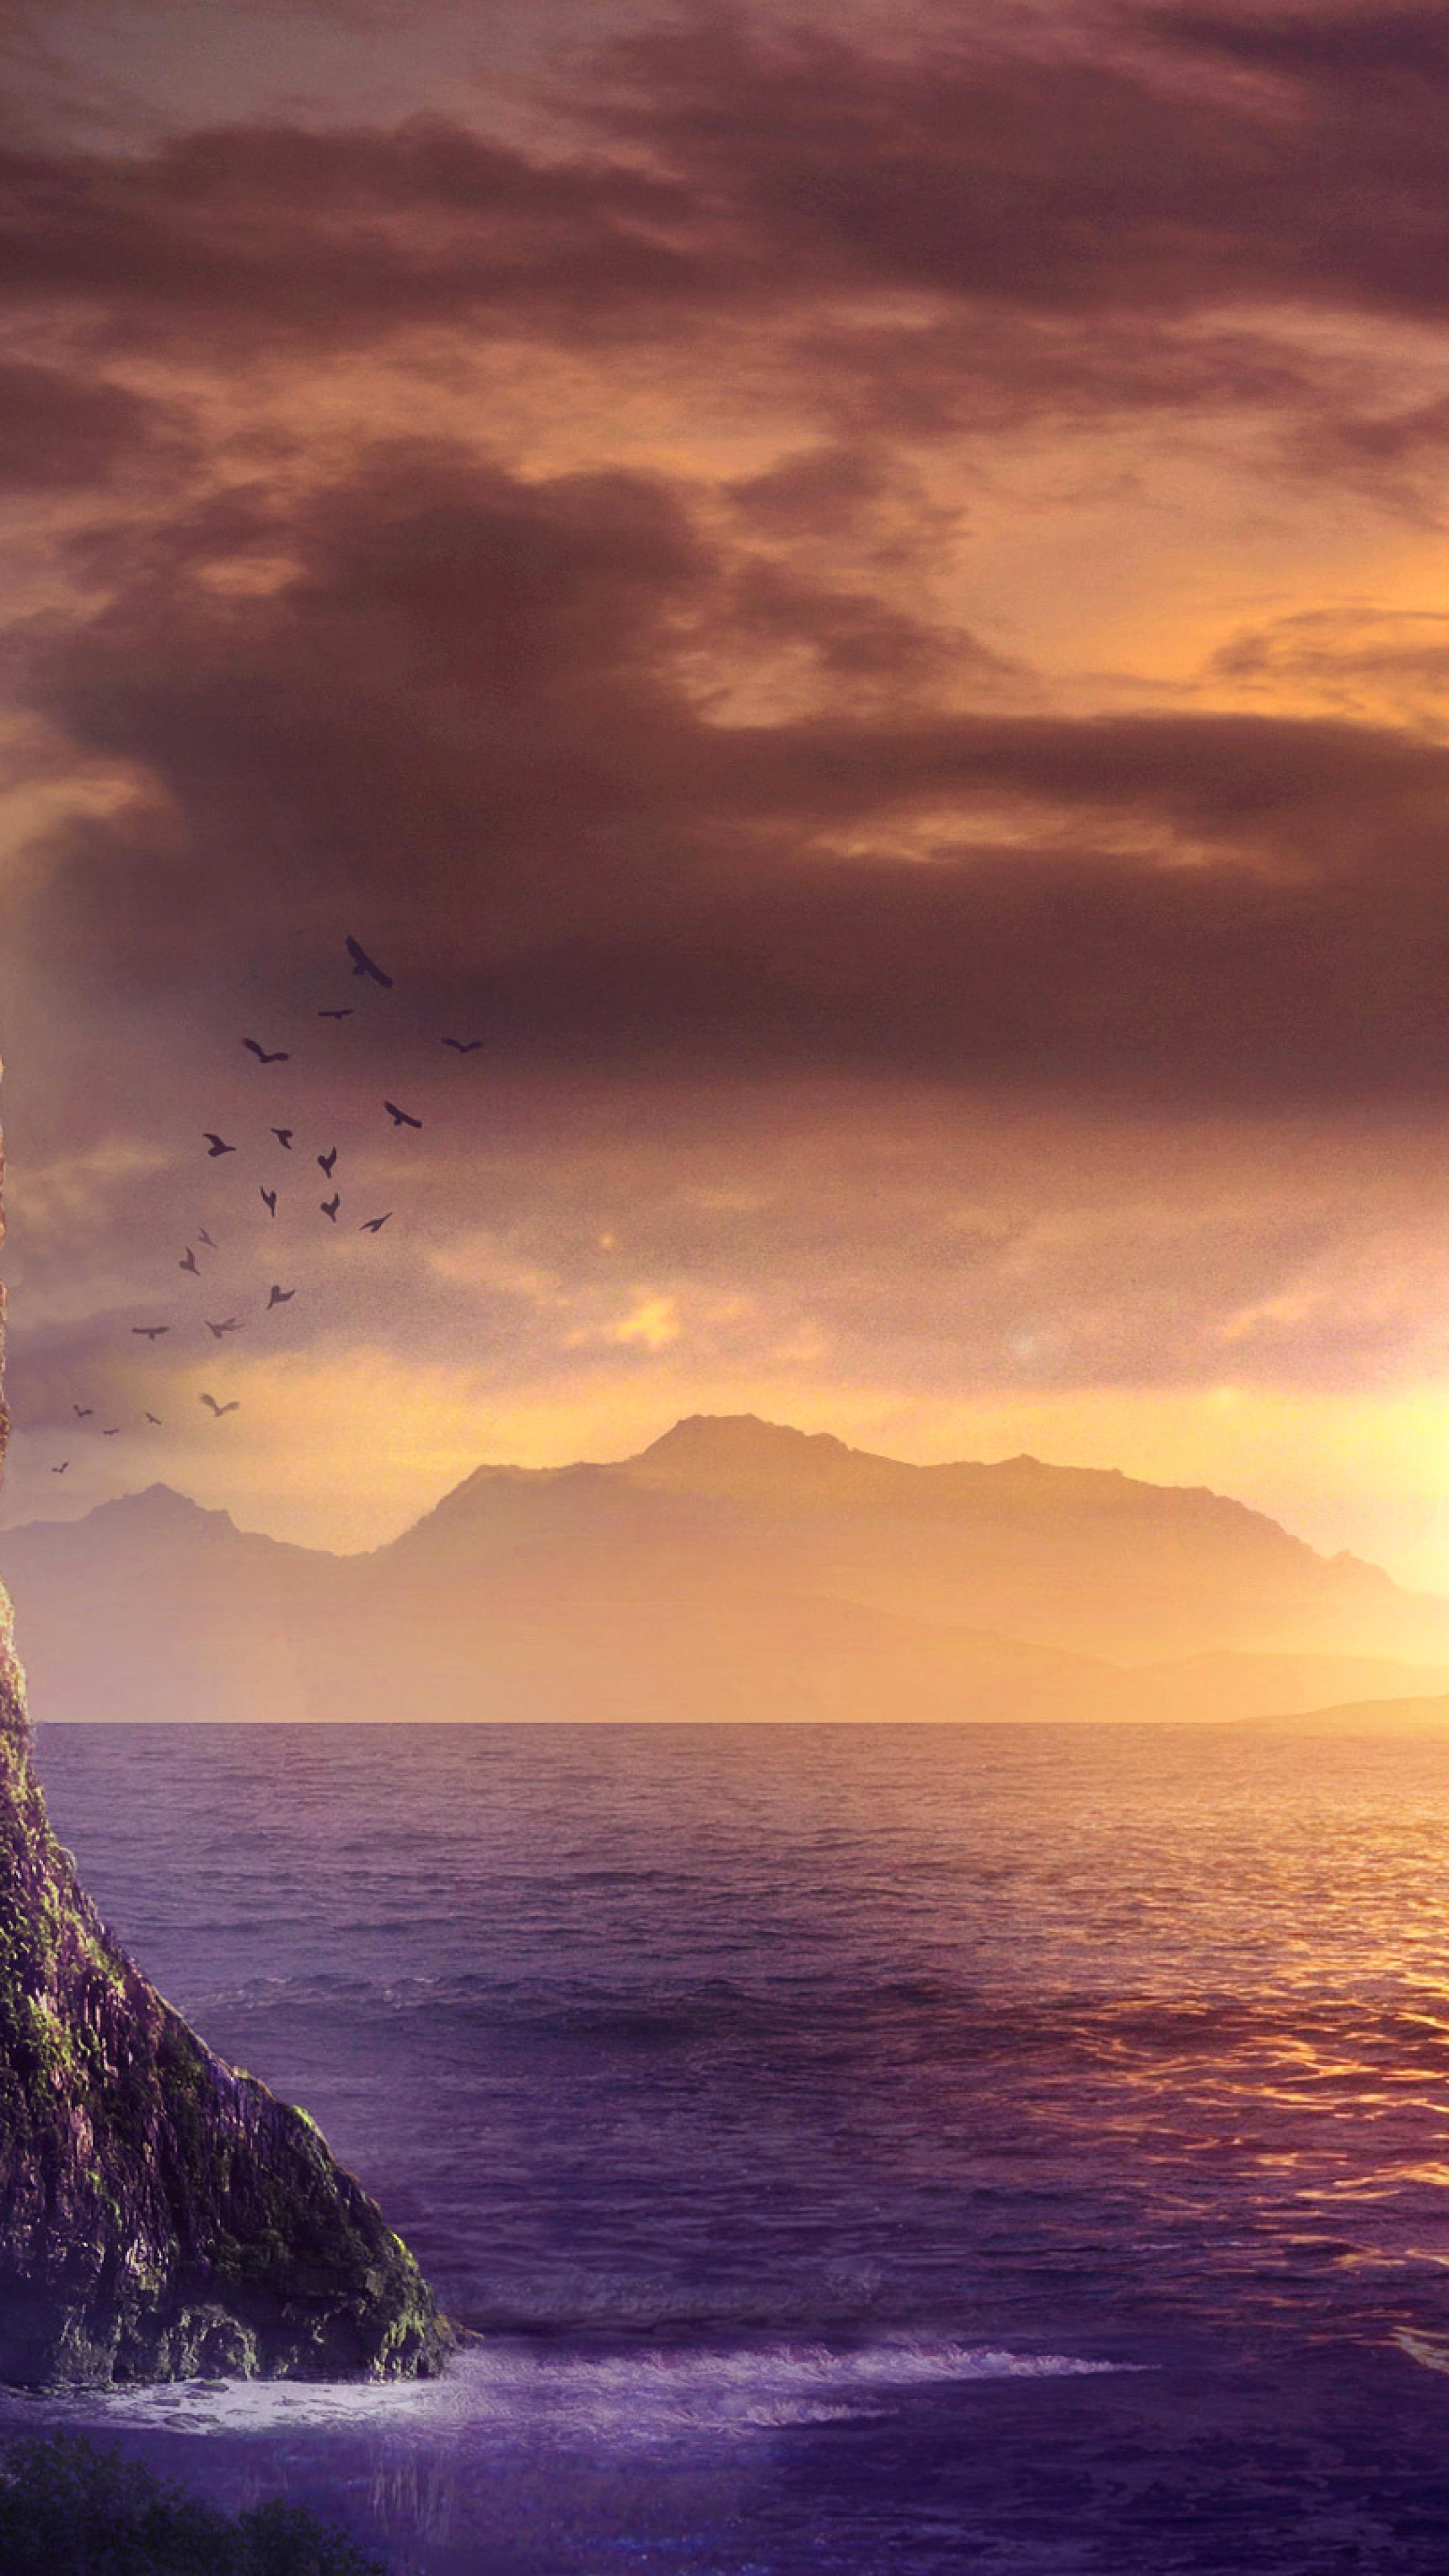 Download spiritual fantasy art sunrise 2160x3840 - Art wallpaper 2160x3840 ...